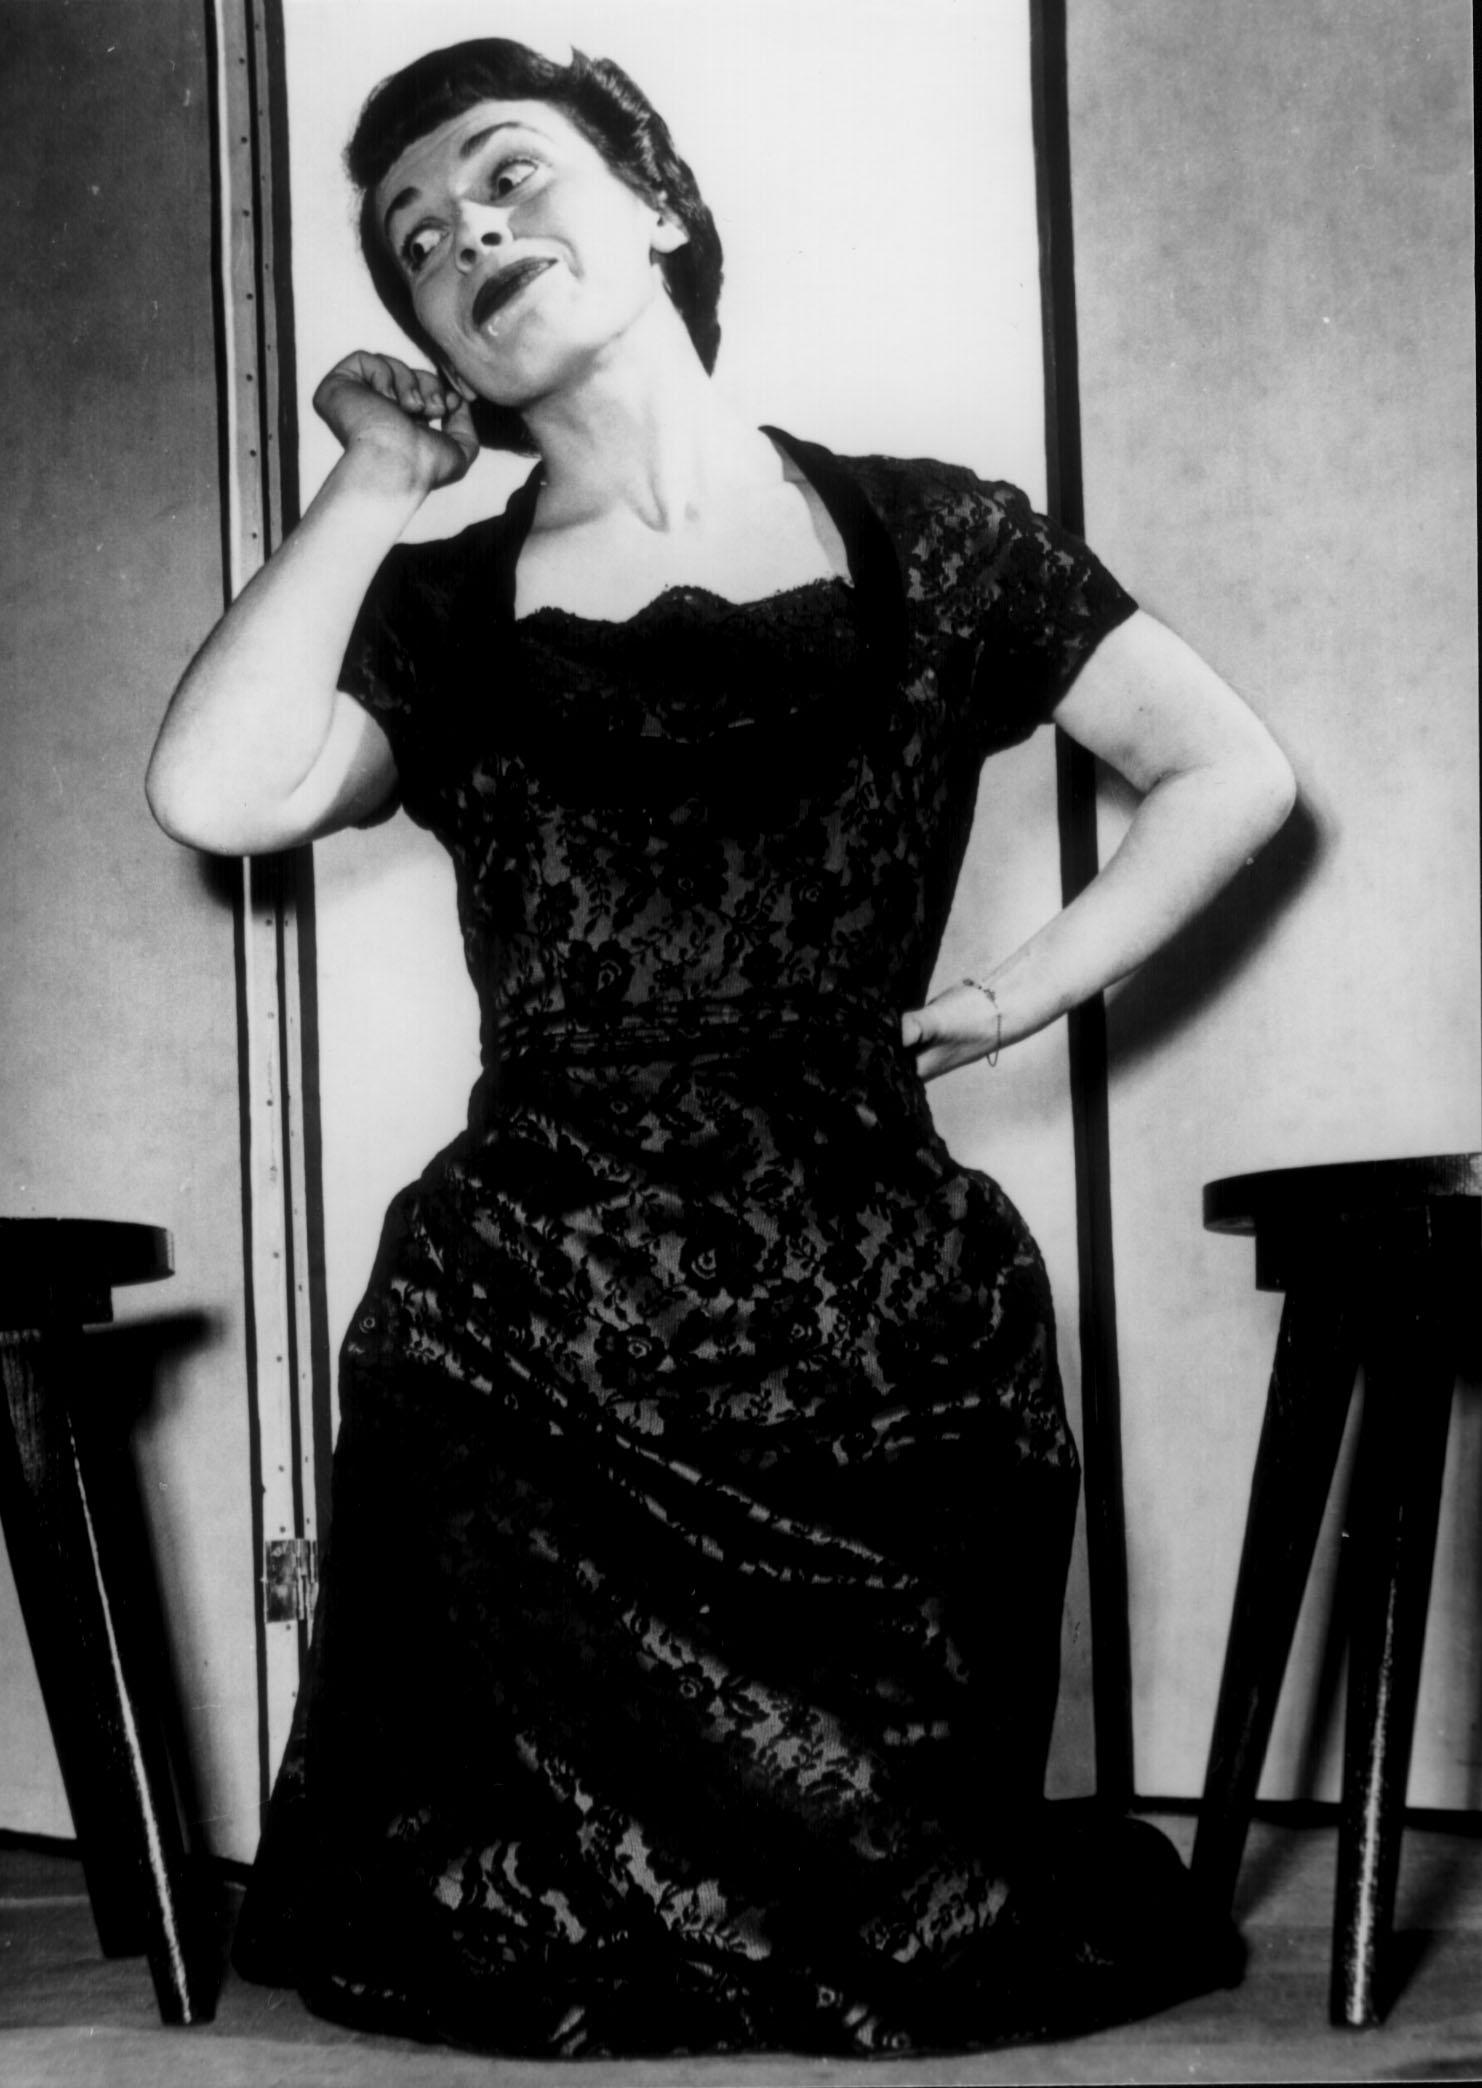 "Franca Valeri ""Signorina Snob"" inCarnet de notesdei Gobbi (Valeri, Bonucci, Caprioli), 1951"